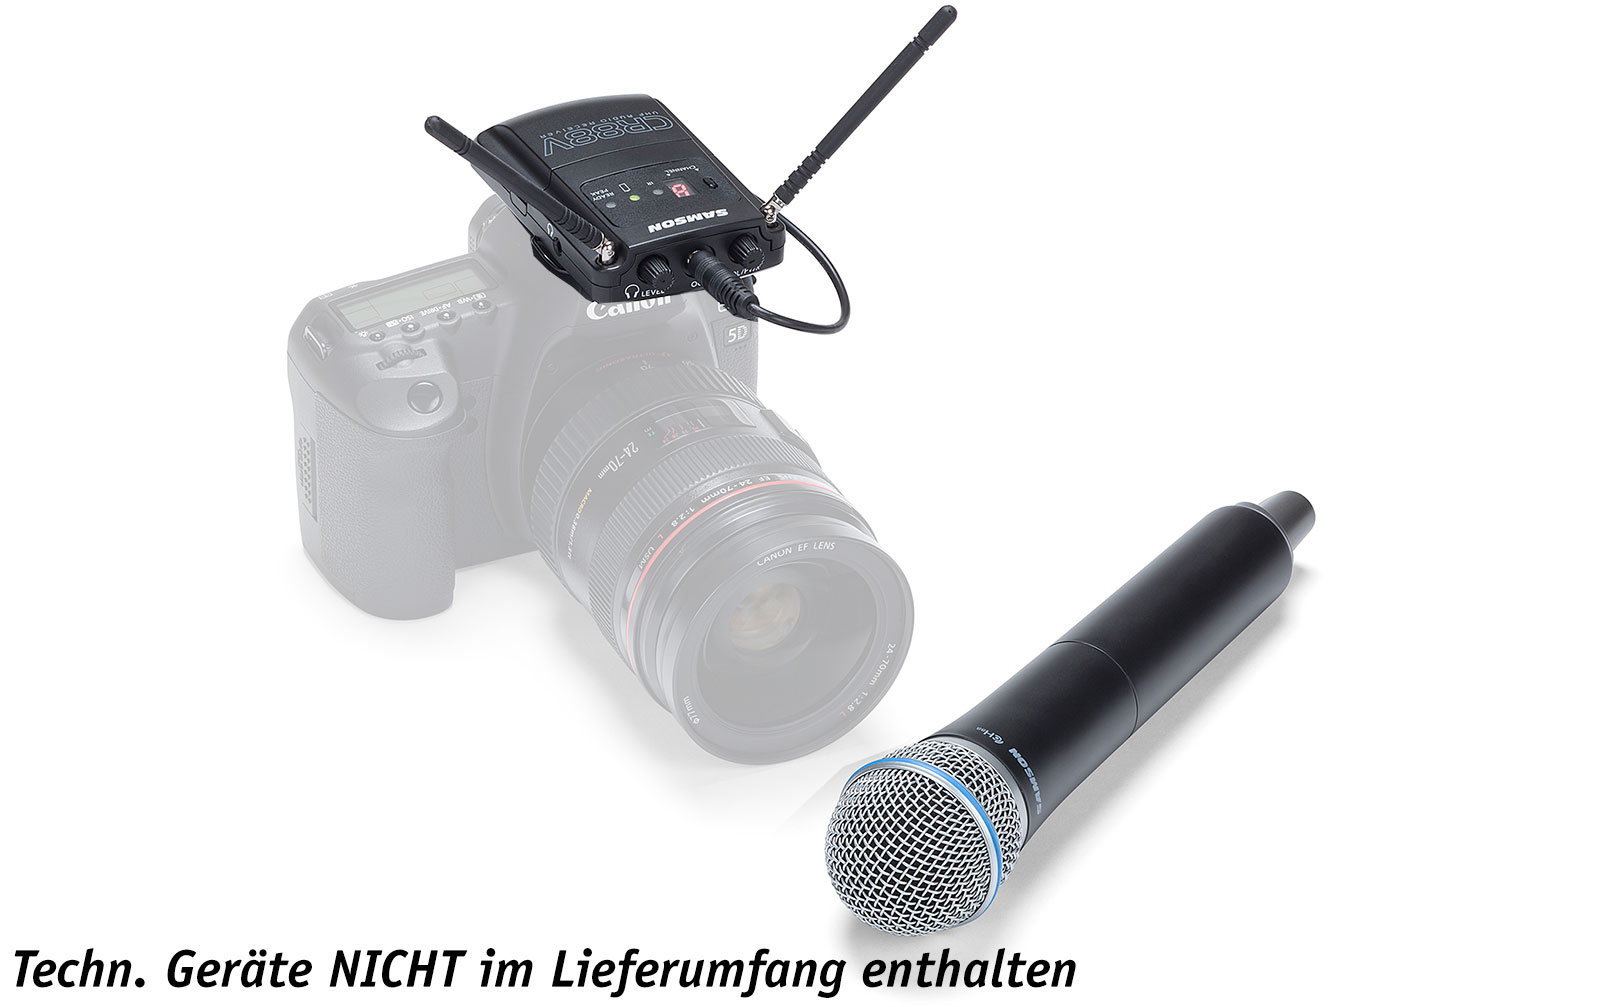 samson-concert-88v-camera-system-handheld-ch38